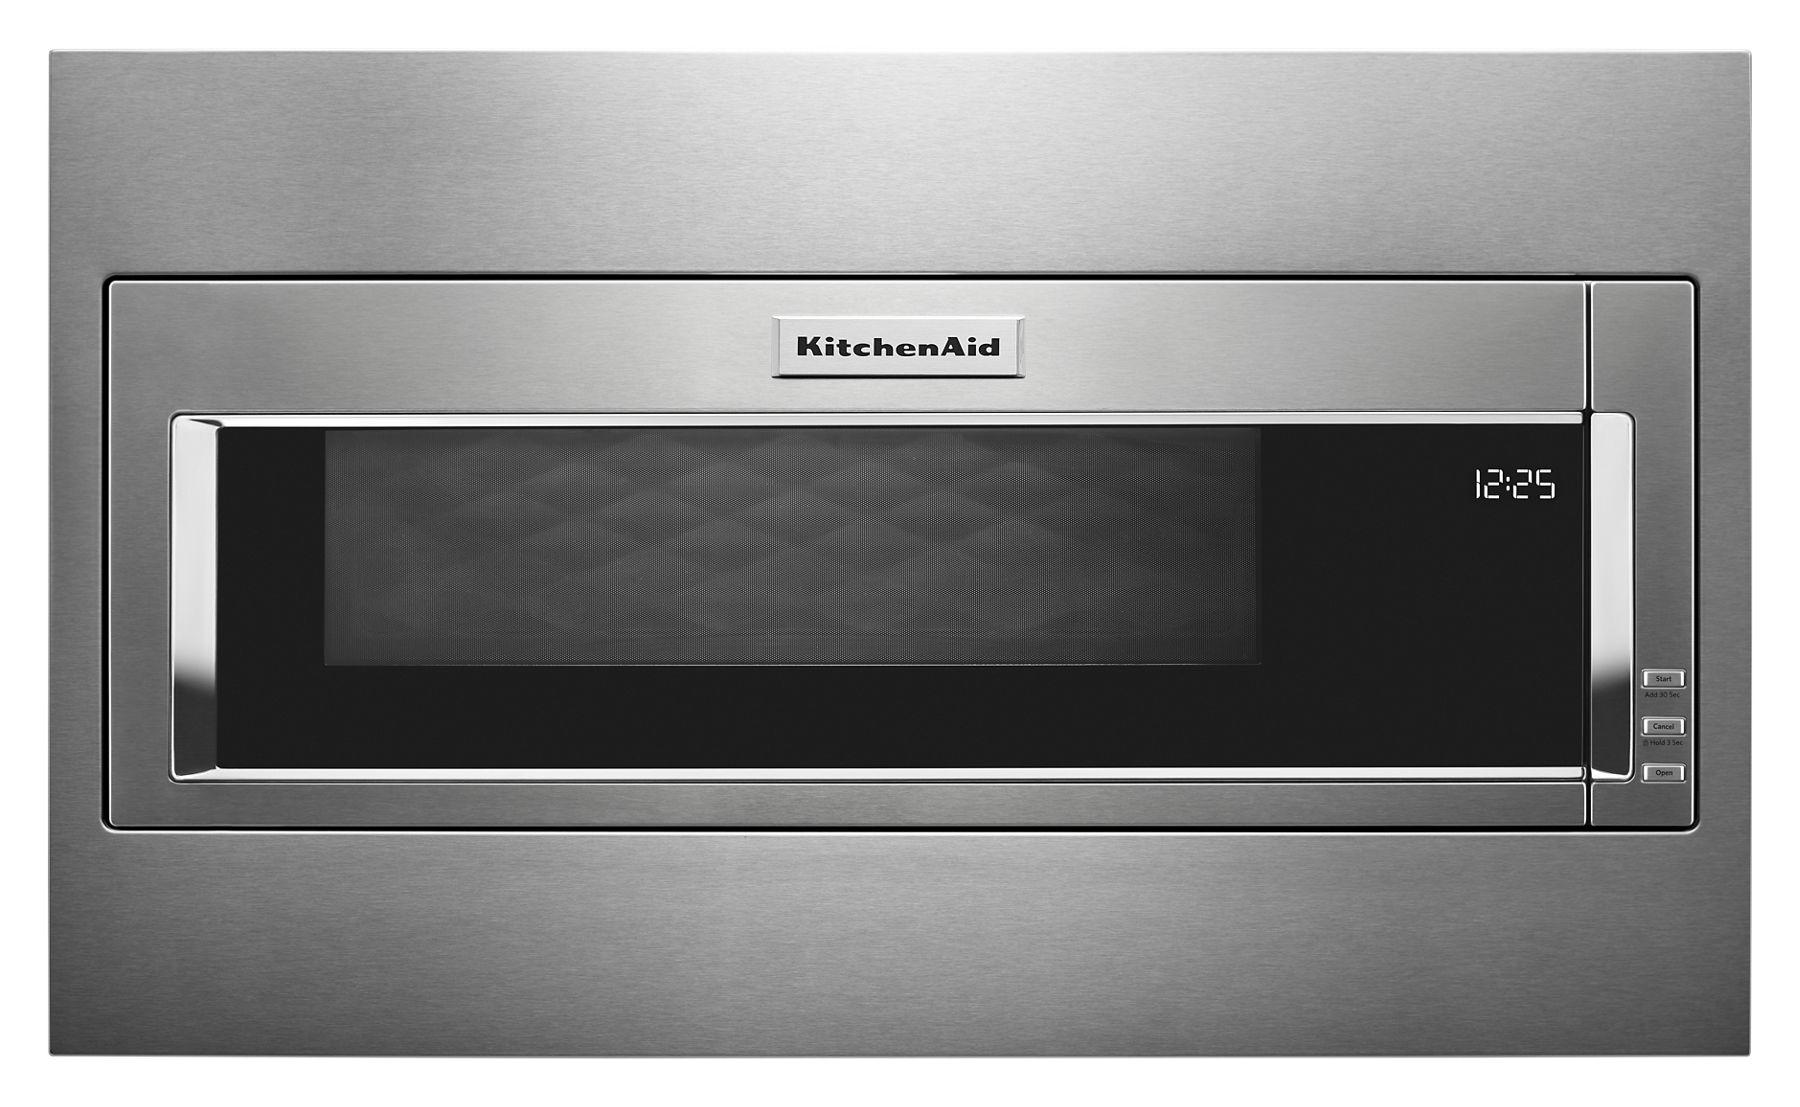 Kitchenaid1000 Watt Built-In Low Profile Microwave With Standard Trim Kit - Stainless Steel